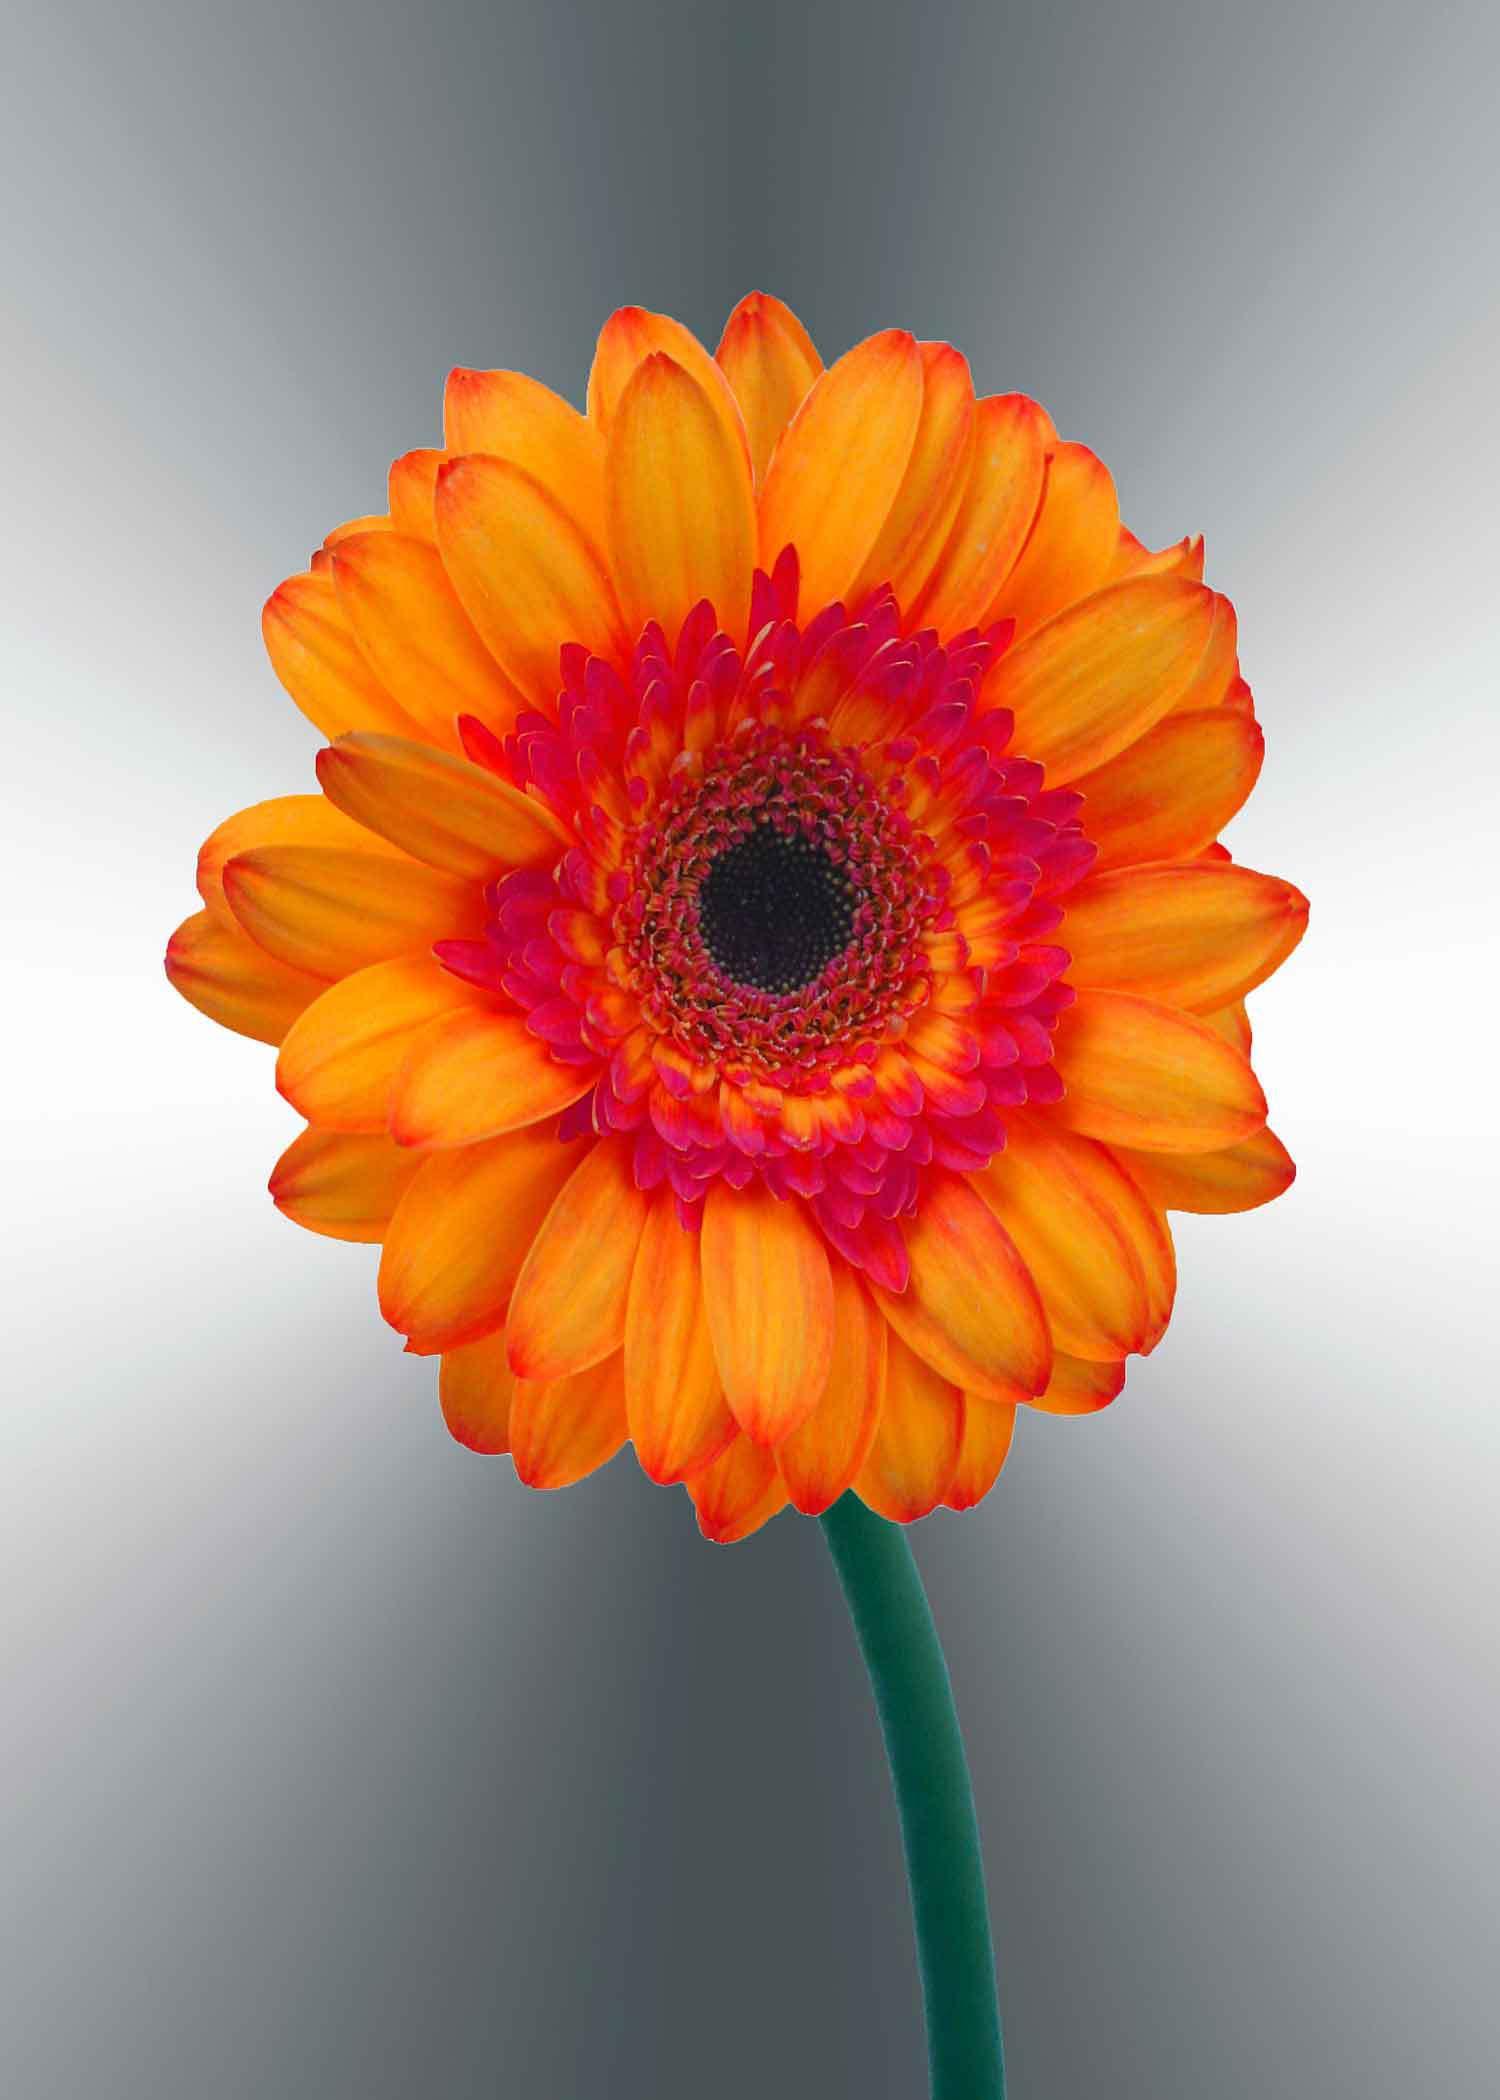 orange-gerger-daisy-5x7-(22-of-236)-Edit-2-copy-2.jpg